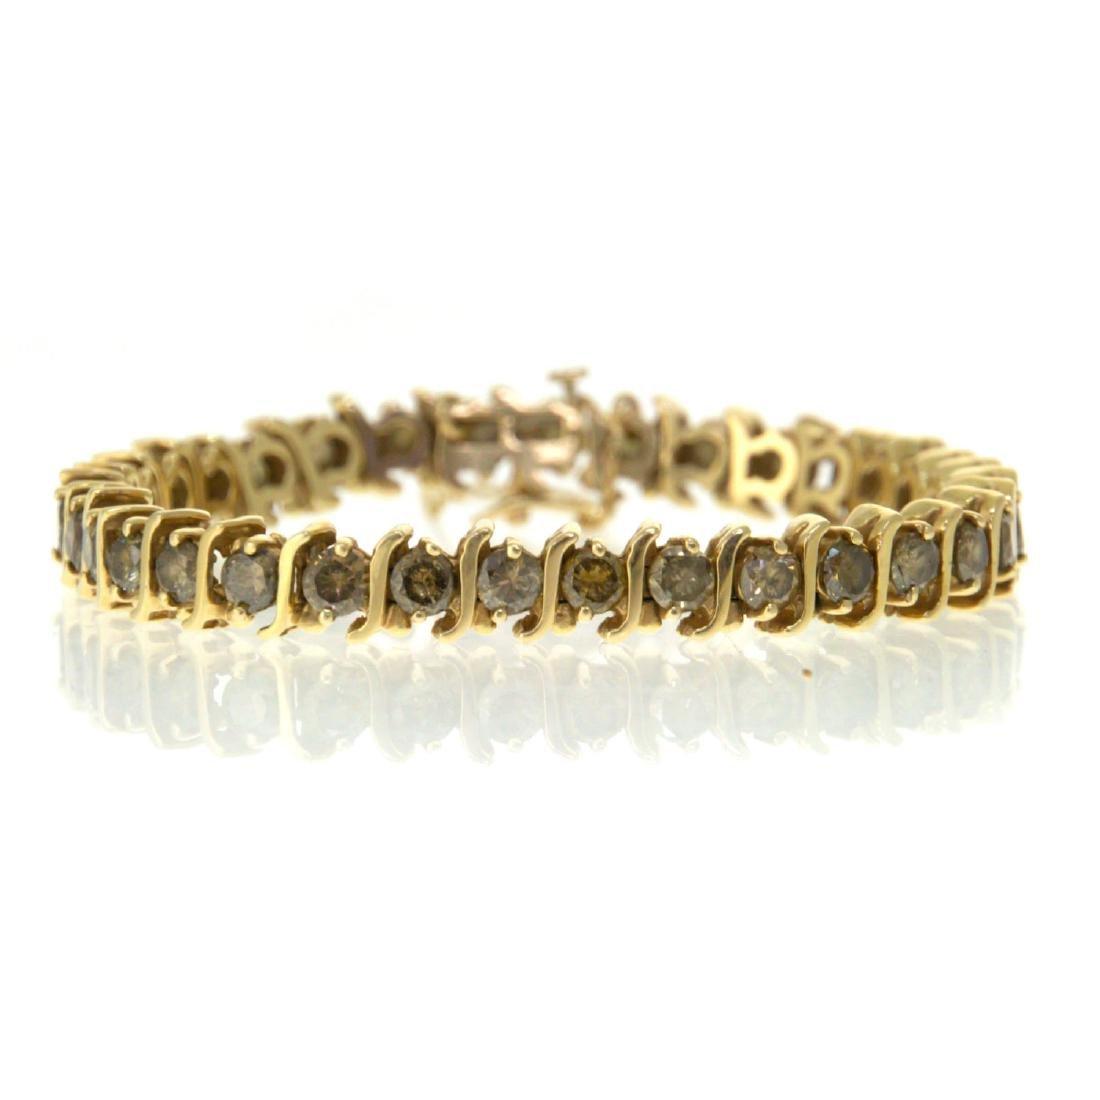 14k Yellow Gold and 9ct Diamond Tennis Bracelet.